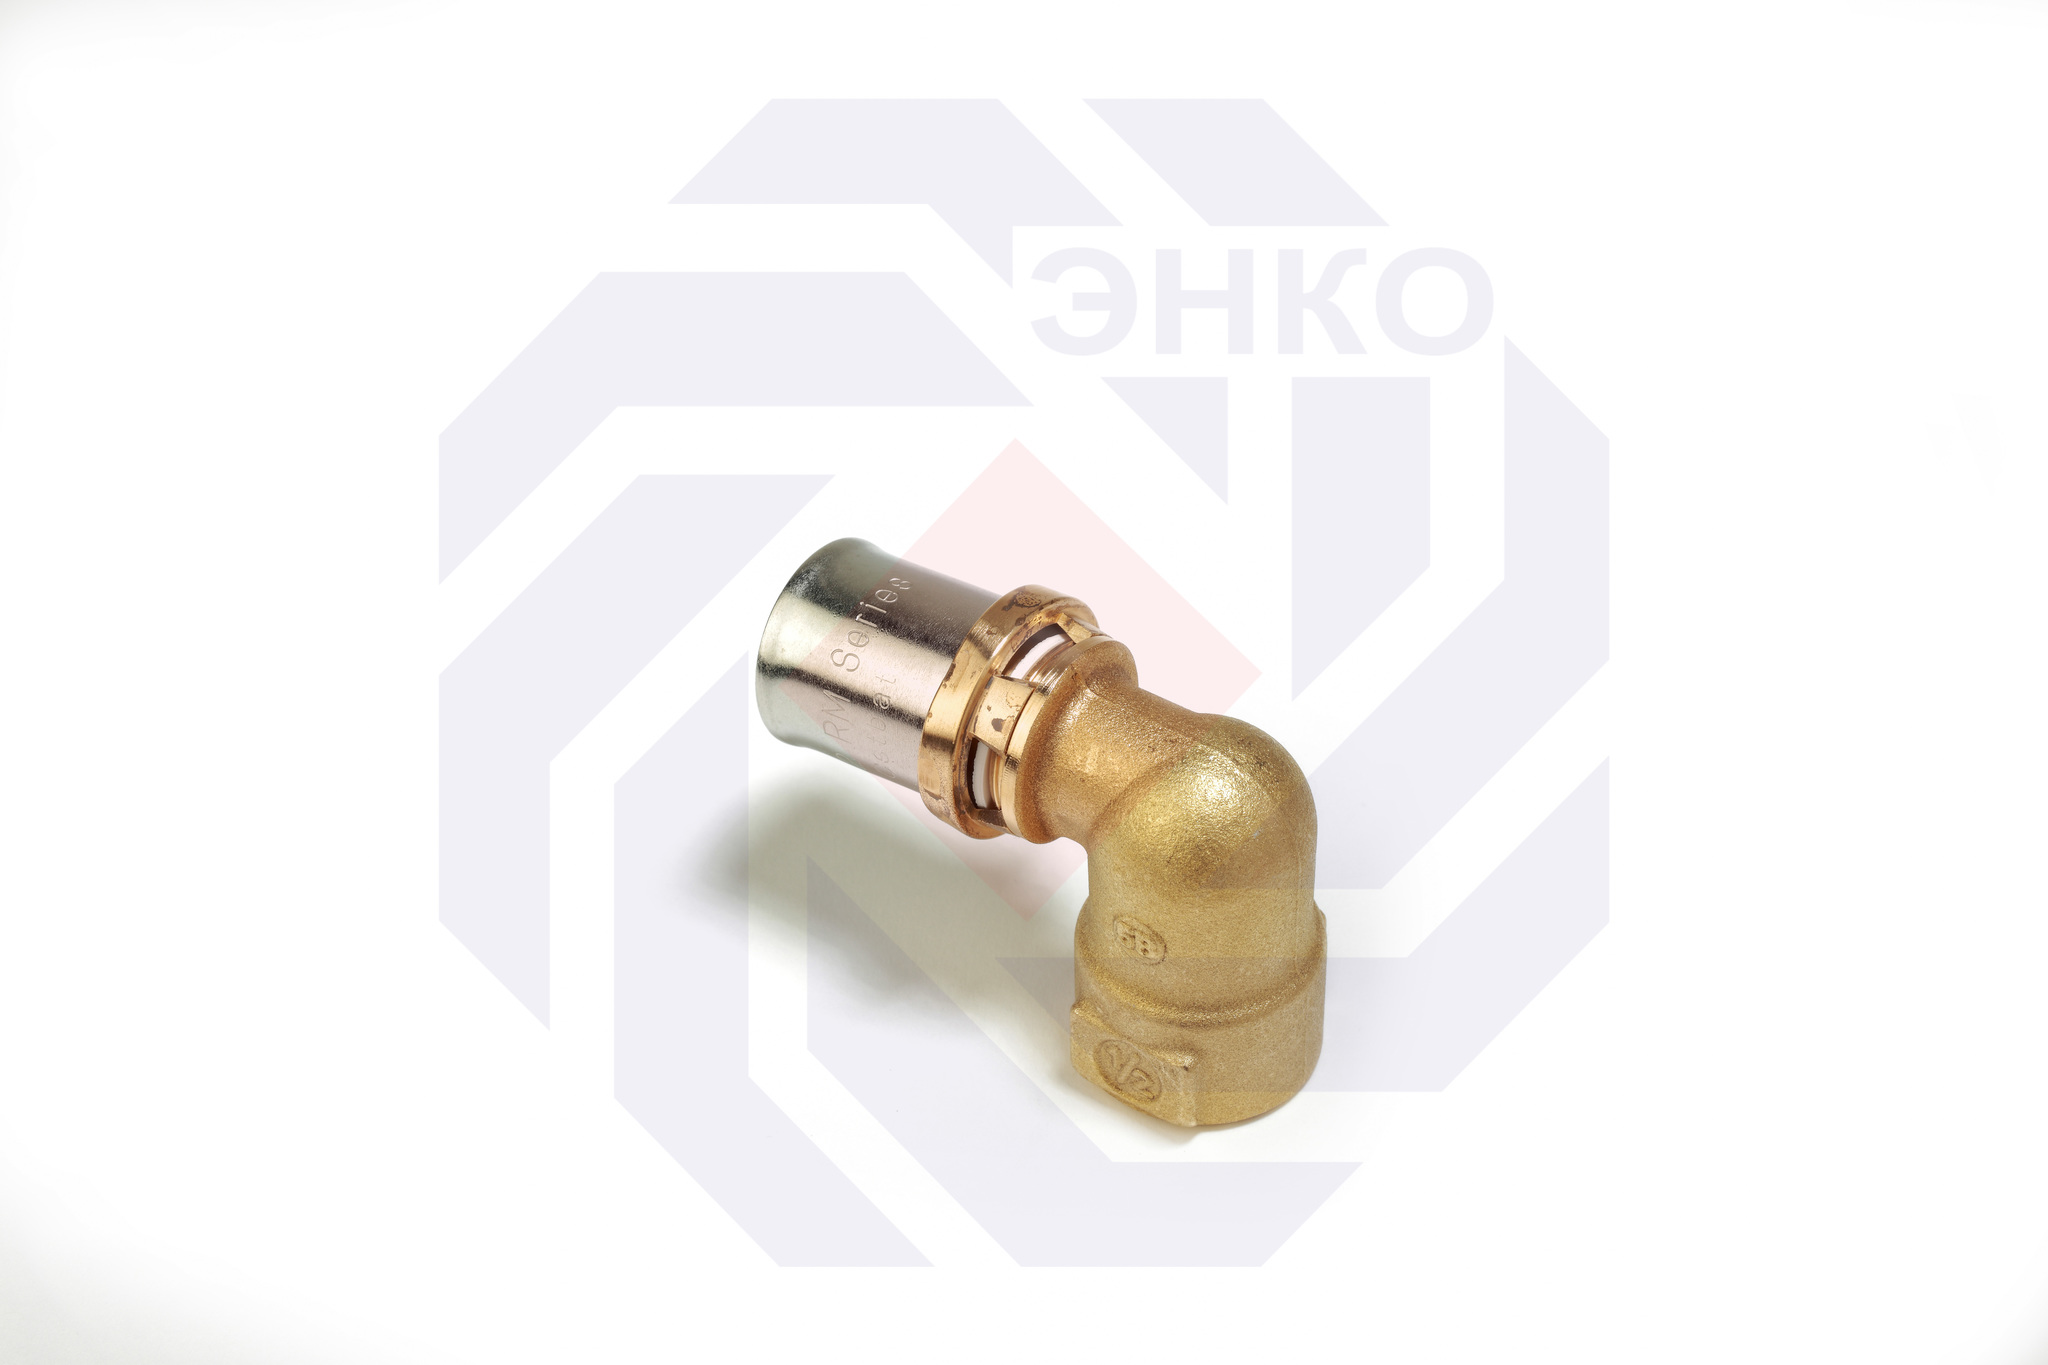 Пресс-фитинг отвод 90° ВР GIACOMINI RM 16⨯½